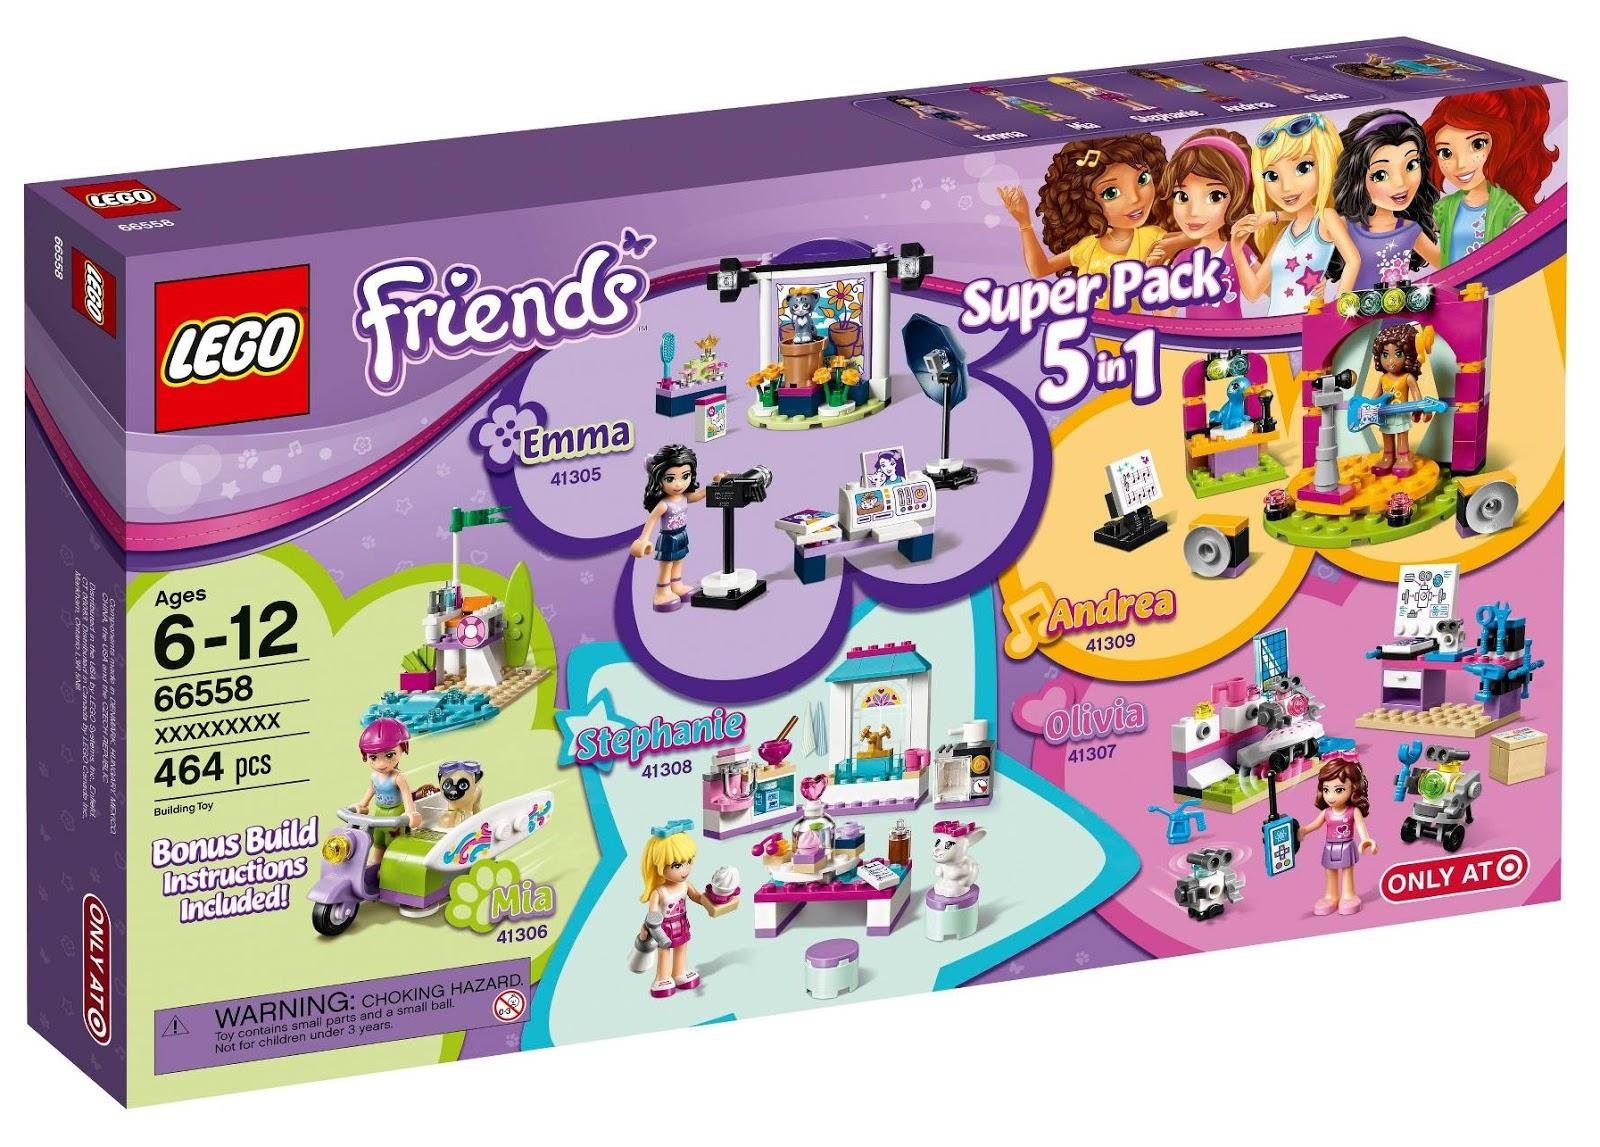 Heartlake Times Lego Friends Super Pack 5 In 1